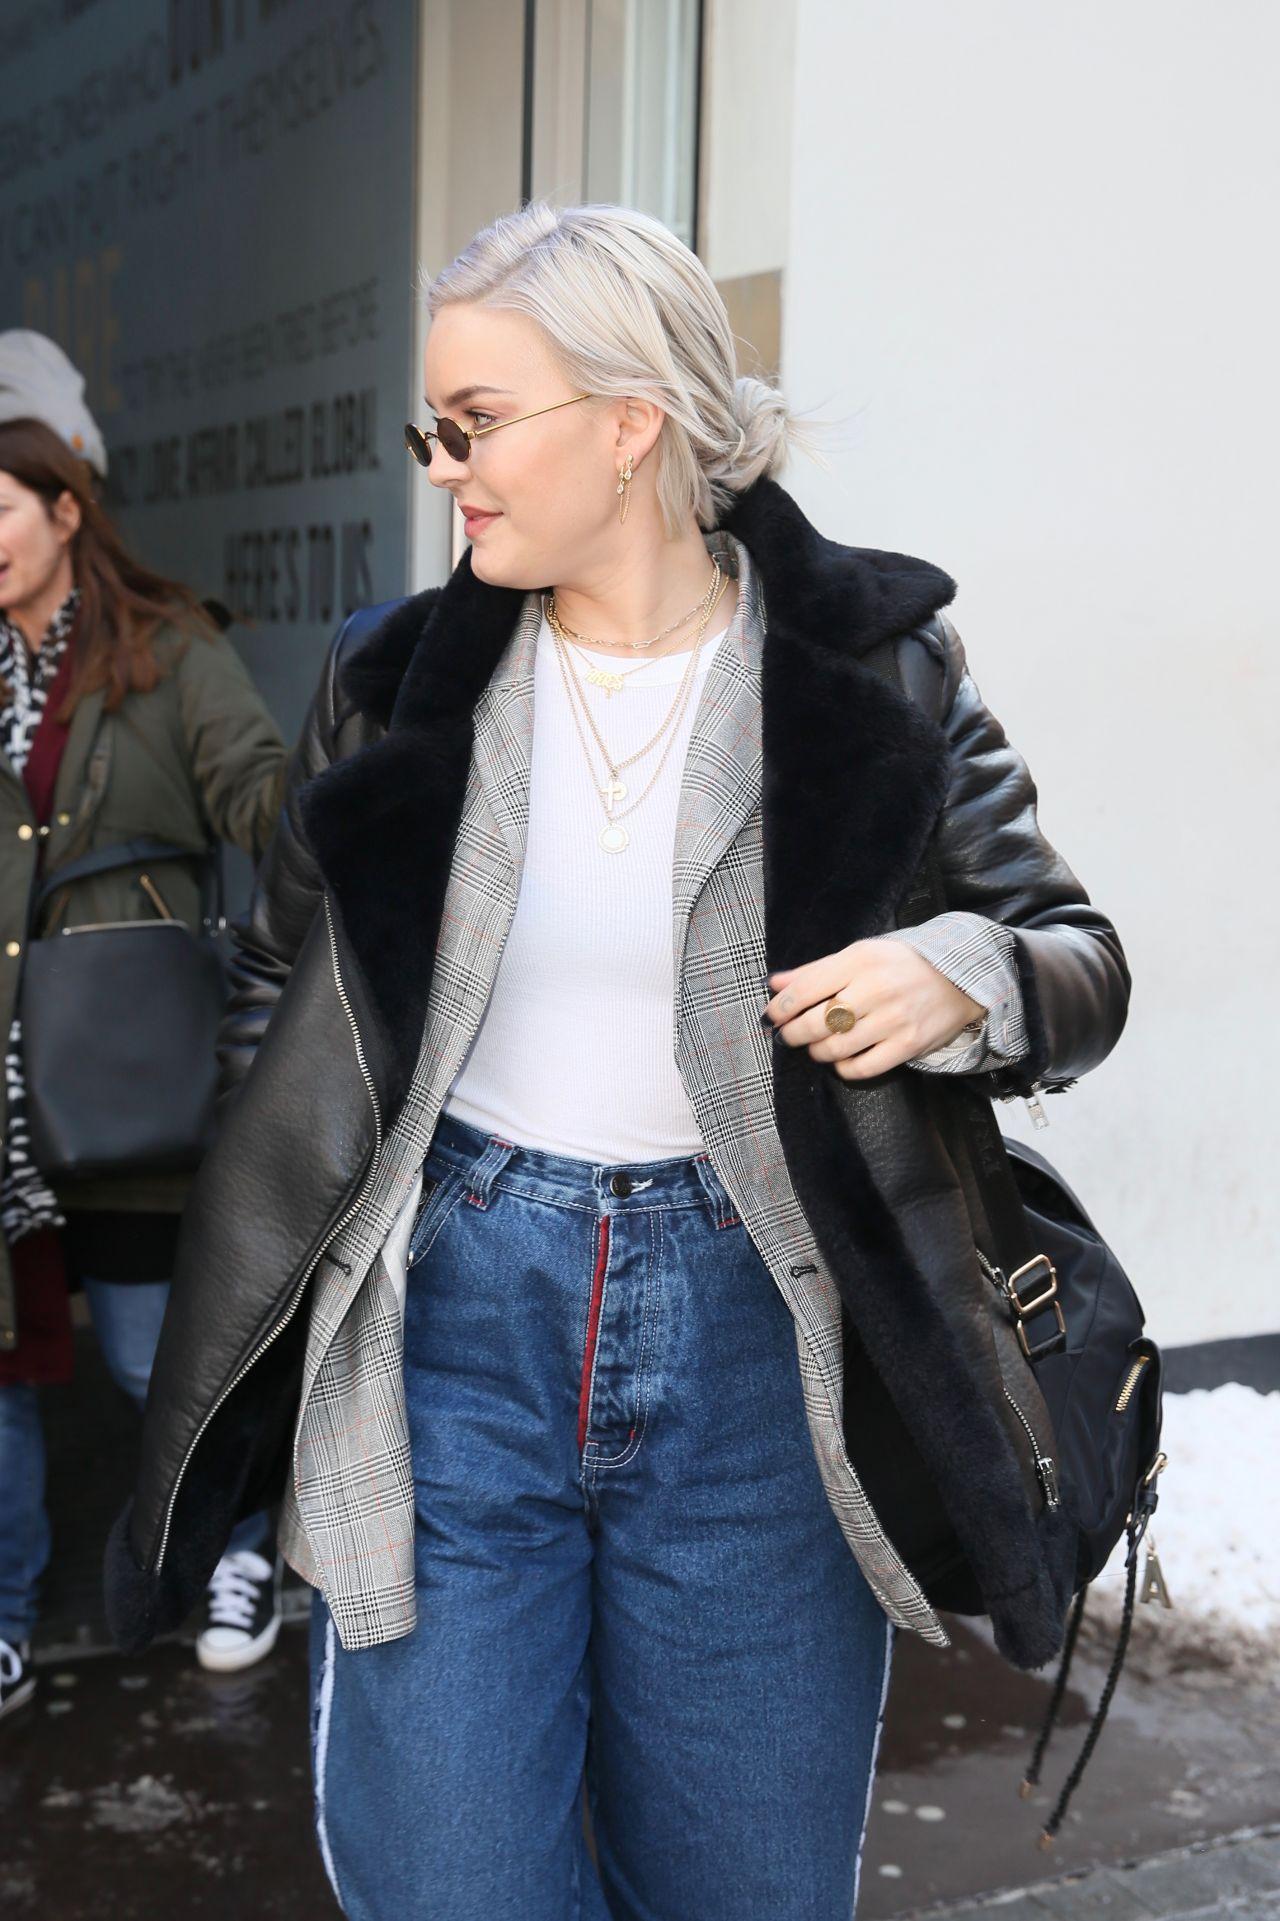 Anne Marie In Casual Outfit Leaving Global Studios In